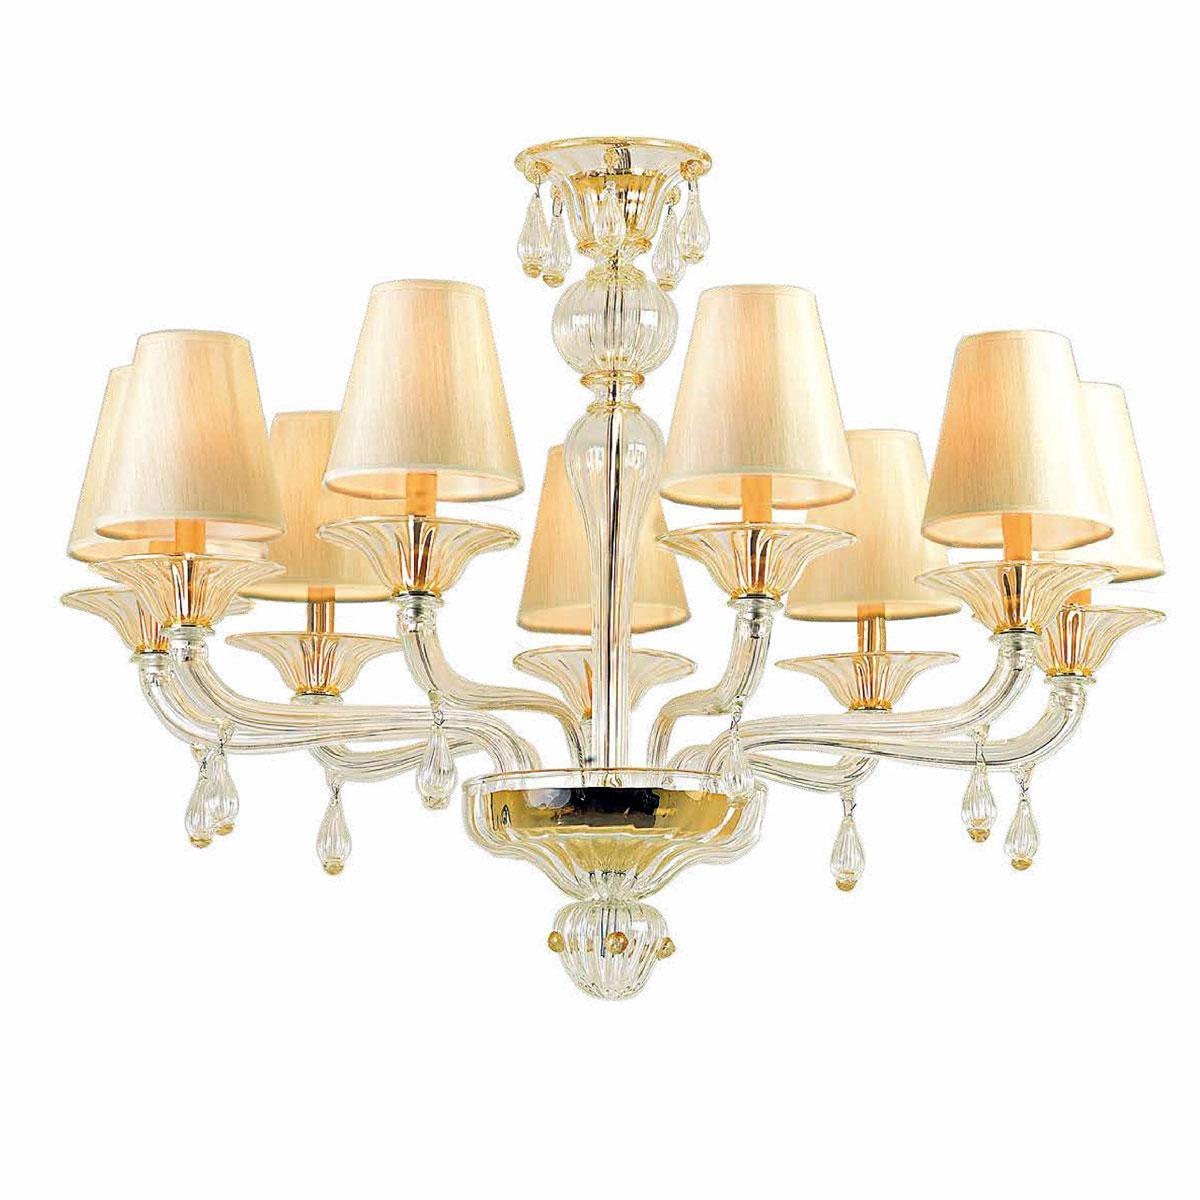 """Vernice"" Murano glas Kronleuchter - 9 flammig - transparent und gold"